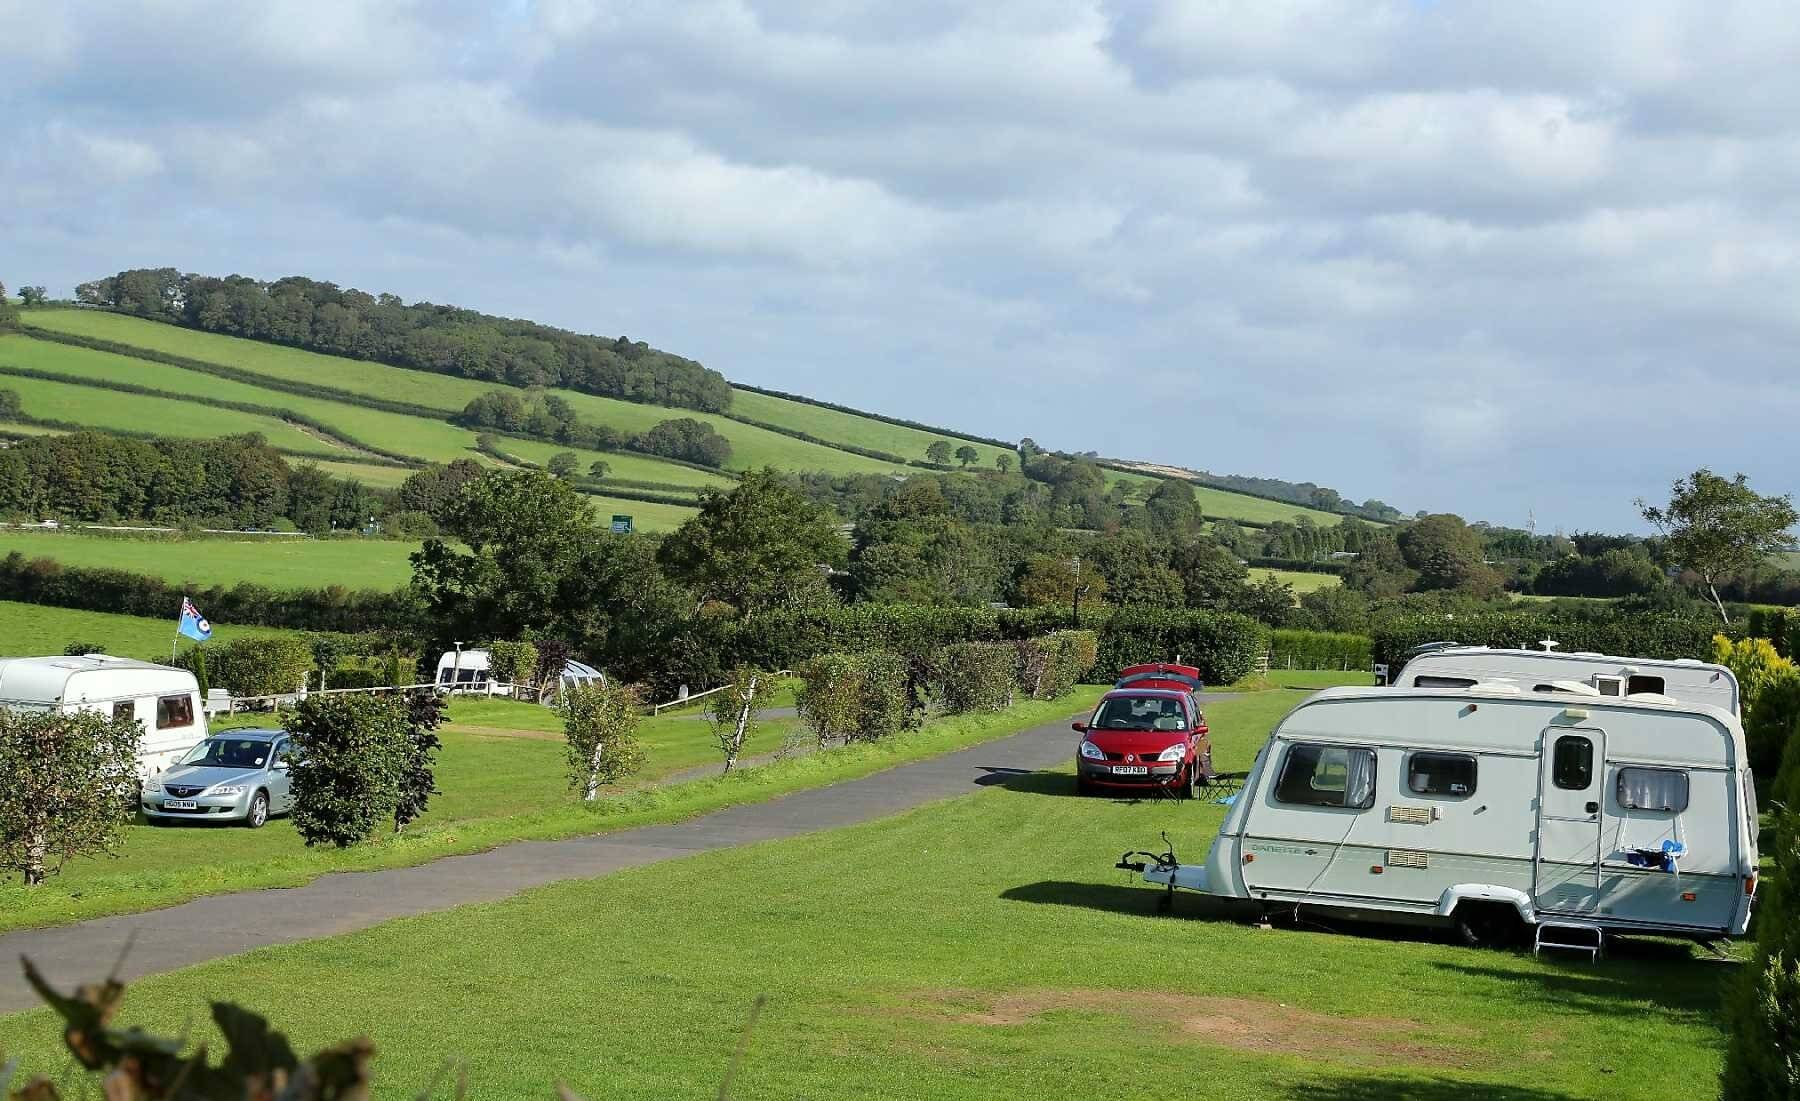 Parkers Farm Holiday Park, Ashburton, South Devon | Head Outside